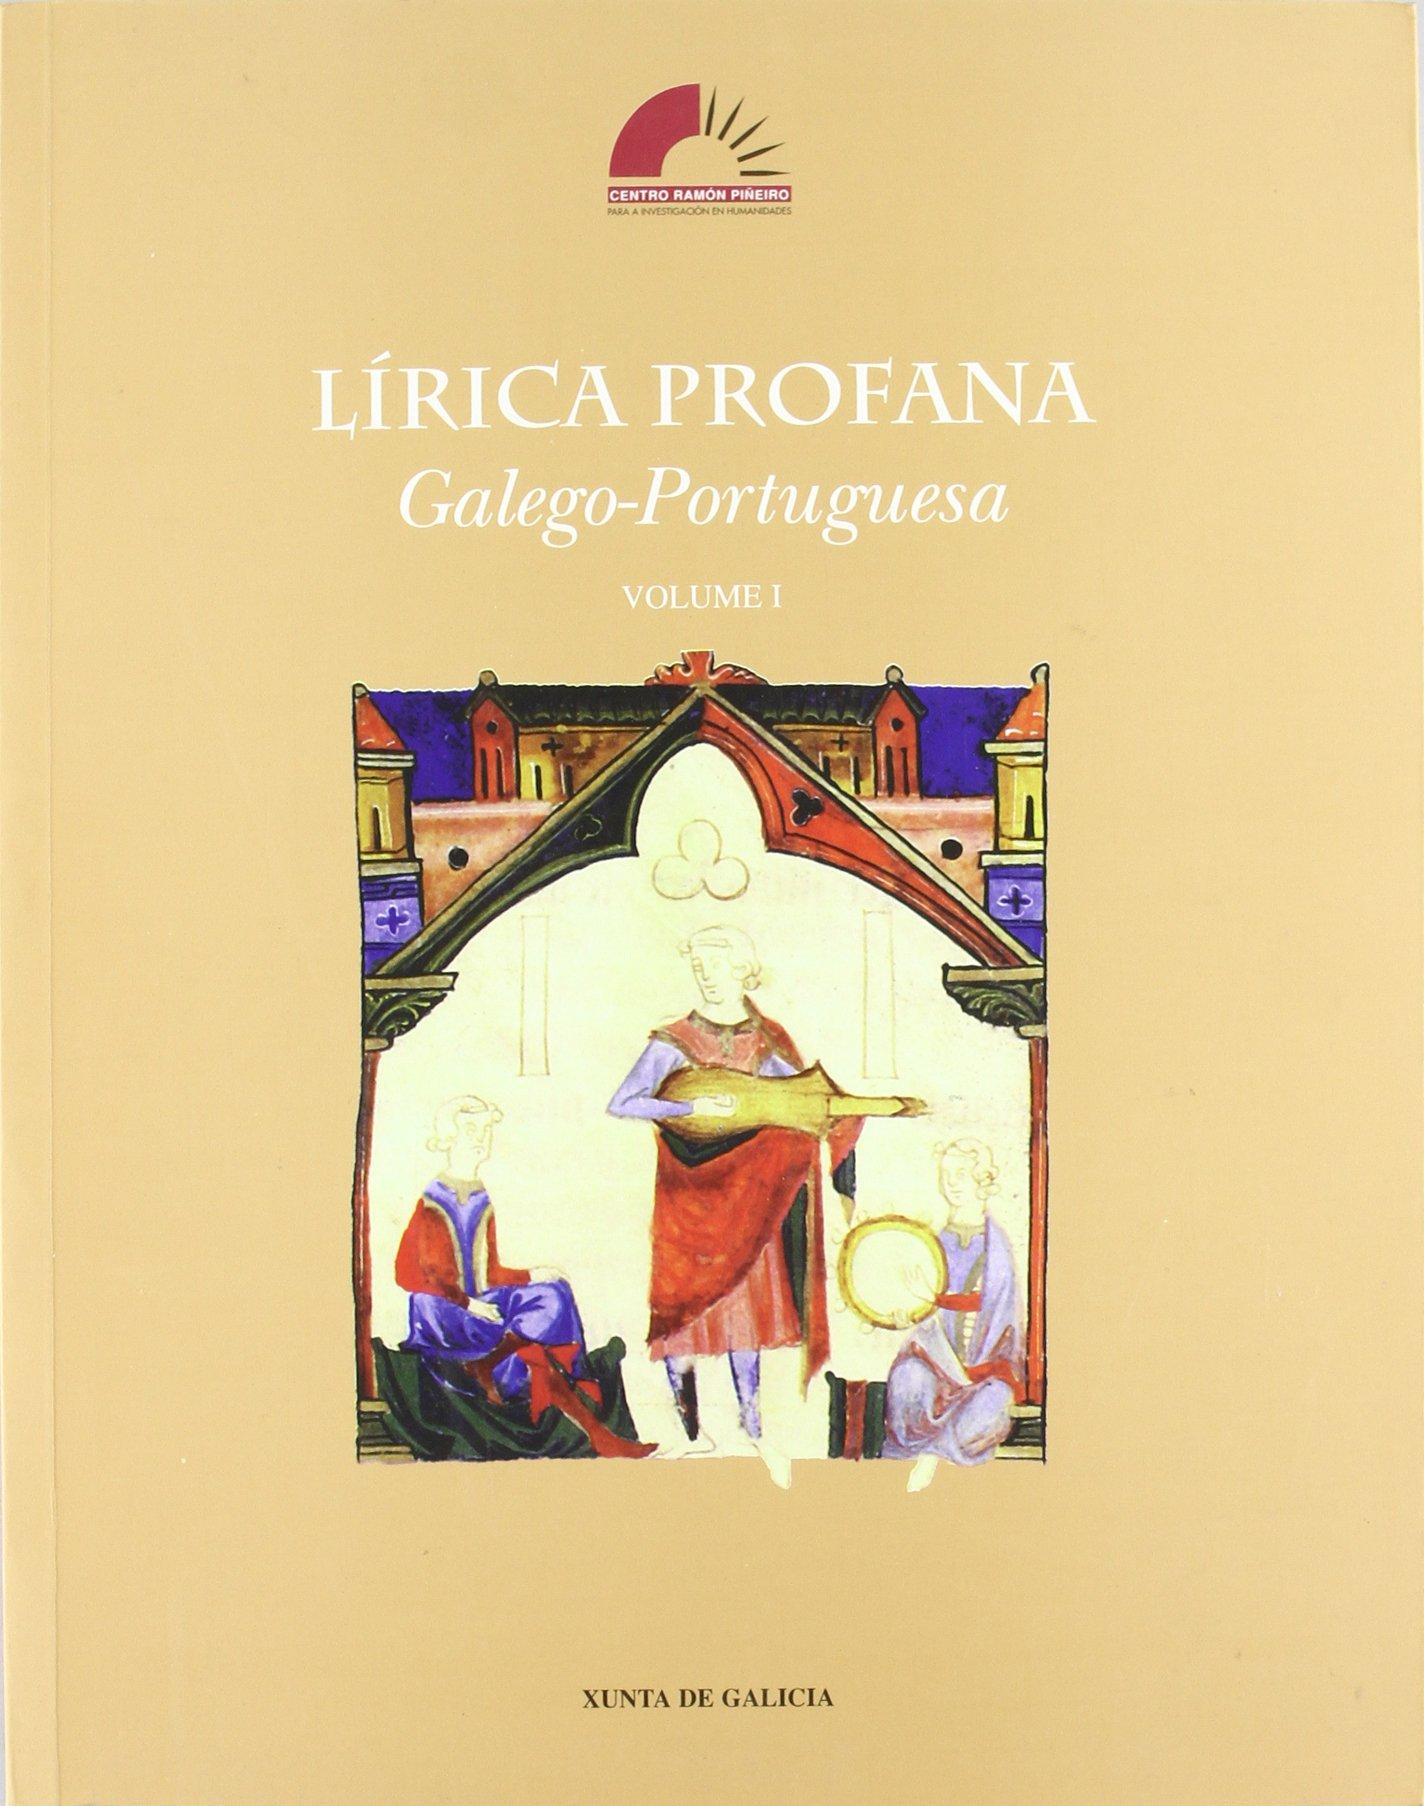 Lirica profana galego-portuguesa: Amazon.es: Brea, Mercedes: Libros